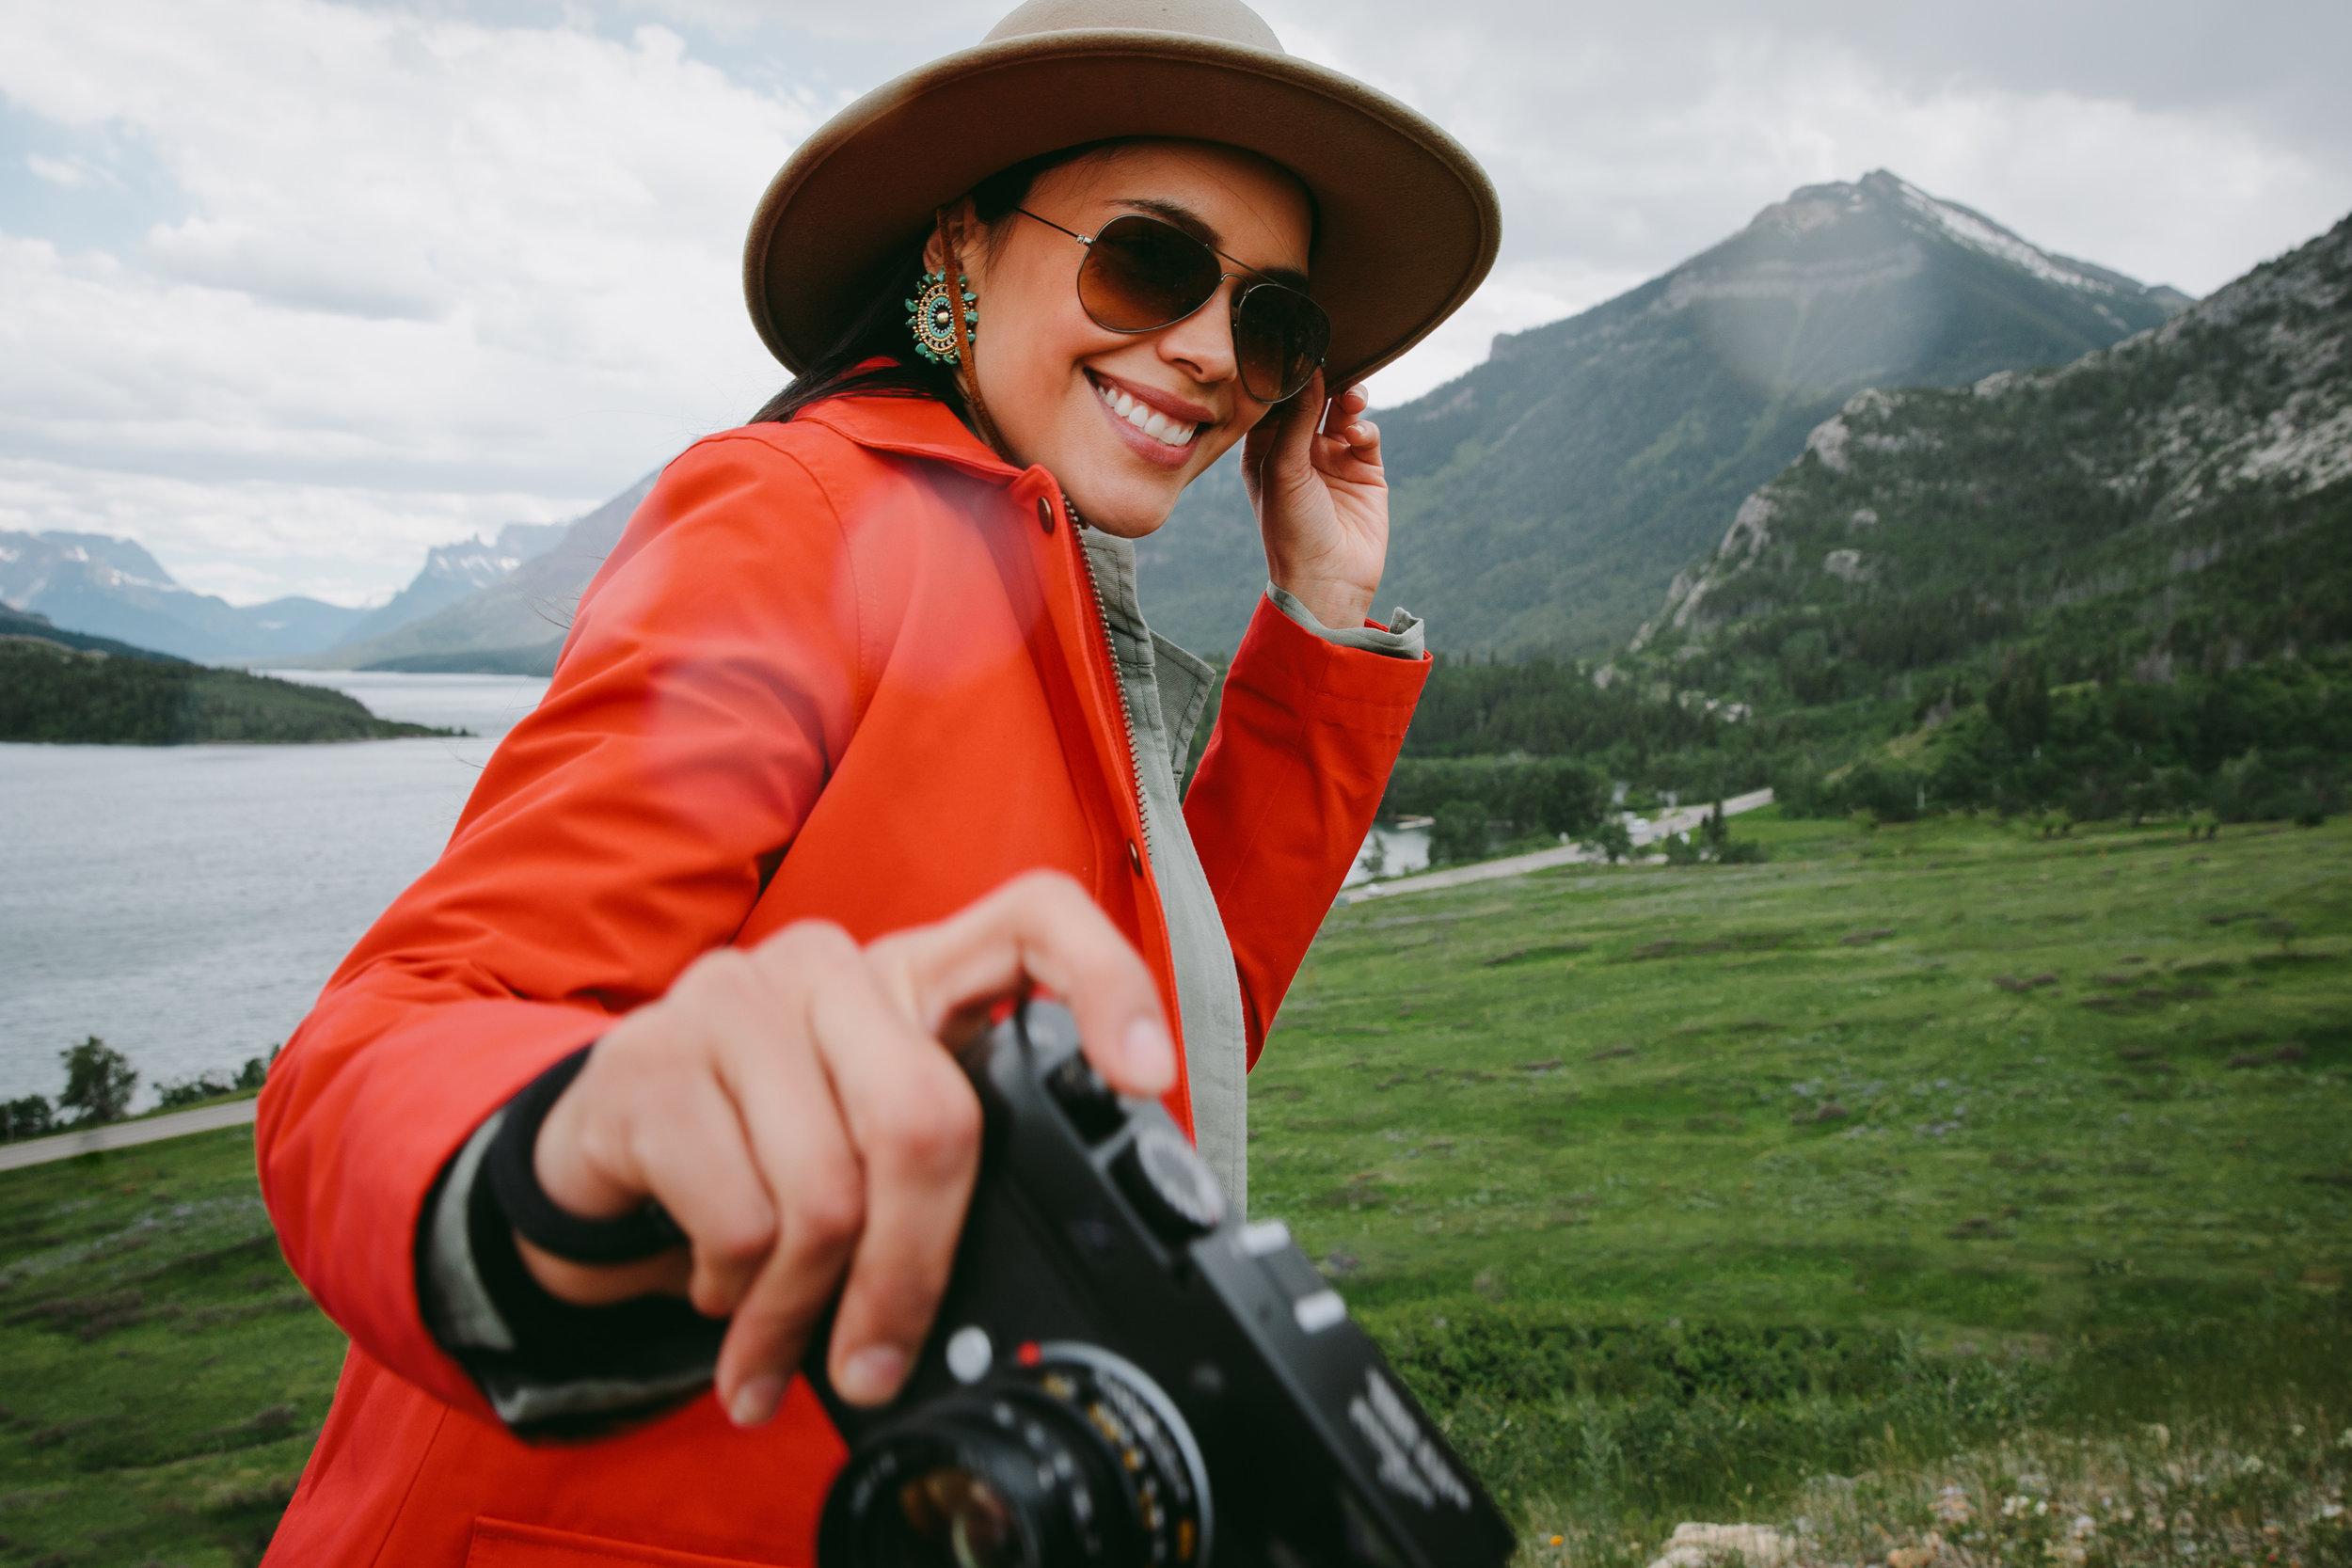 MikeSeehagel-TravelAlberta-Ready-Rebrand_Canada-LifestylePhotography_05.jpg